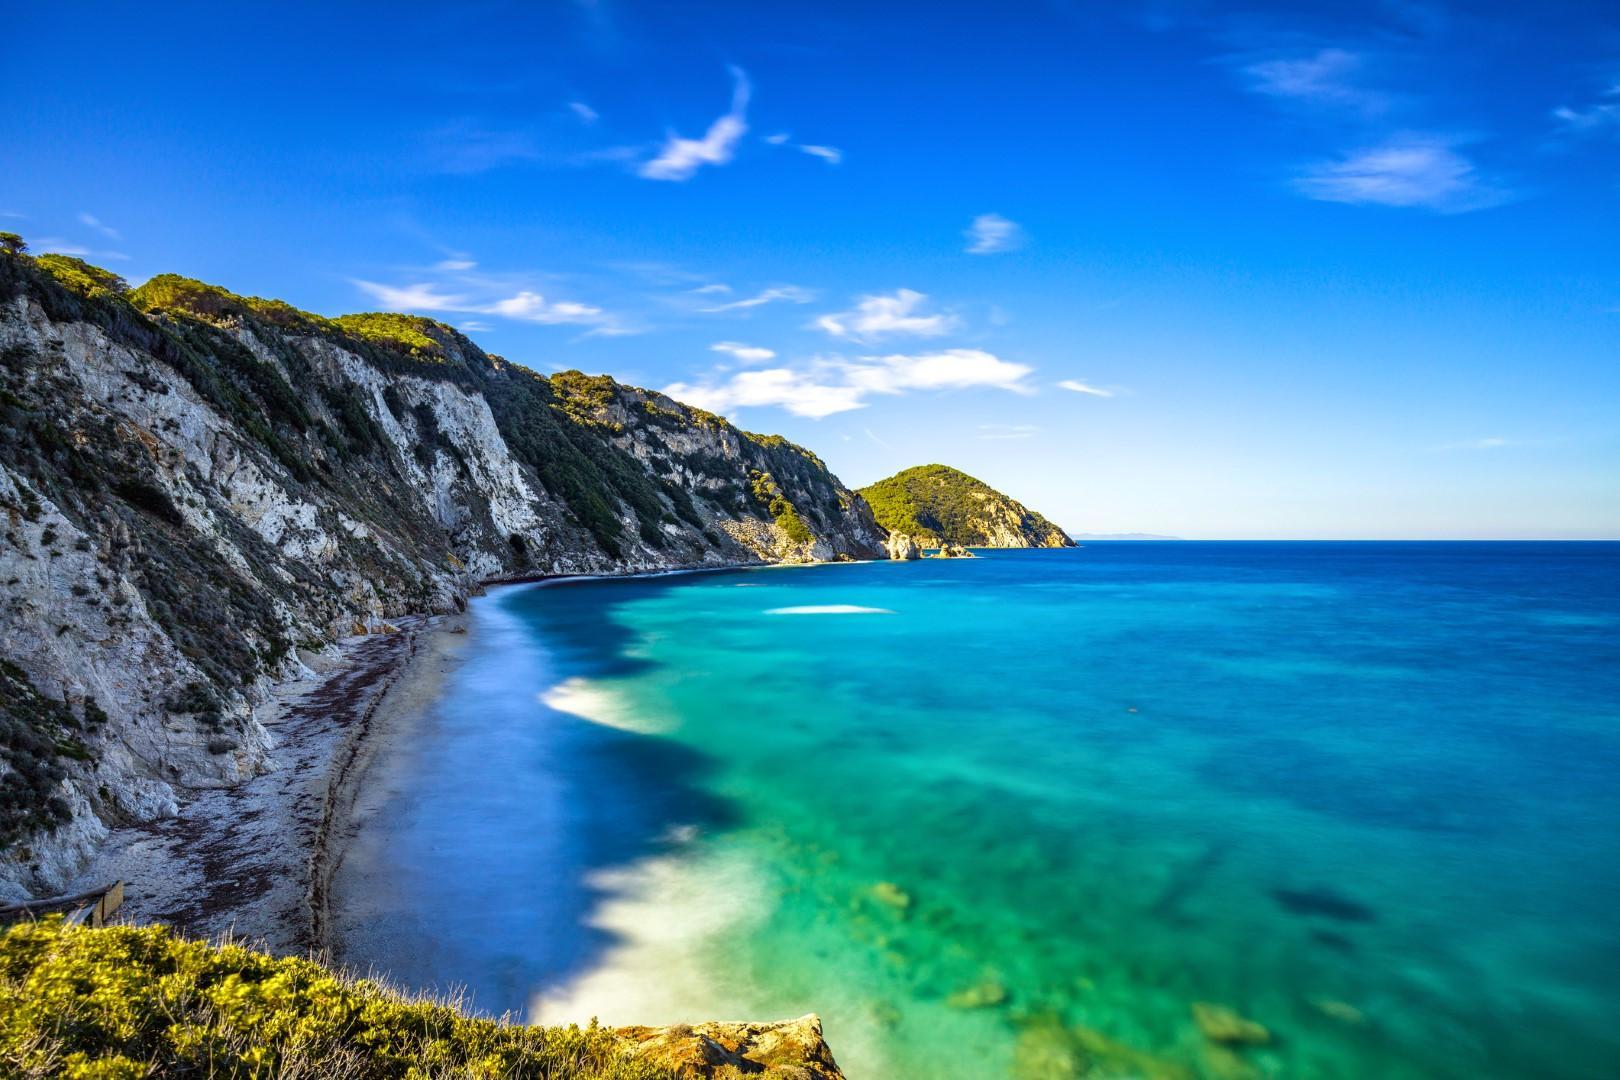 Parchi nazionali: i più belli d'Europa per immergersi nella natura